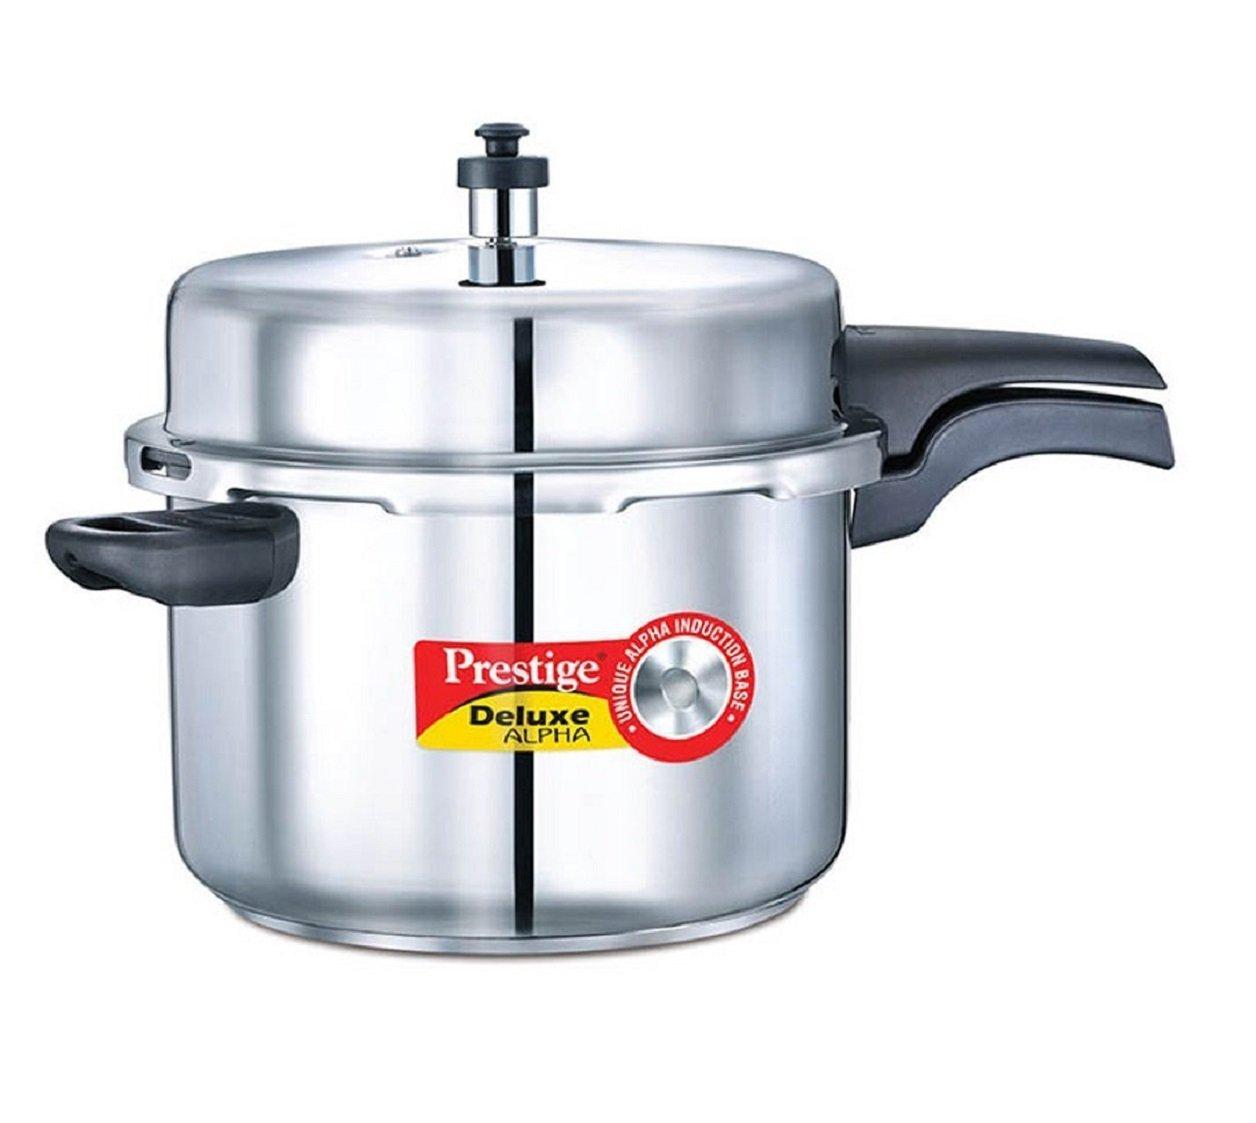 Prestige PRDA8 Deluxe Alpha Induction Base Pressure Cooker, 8-Liter, Stainless Steel